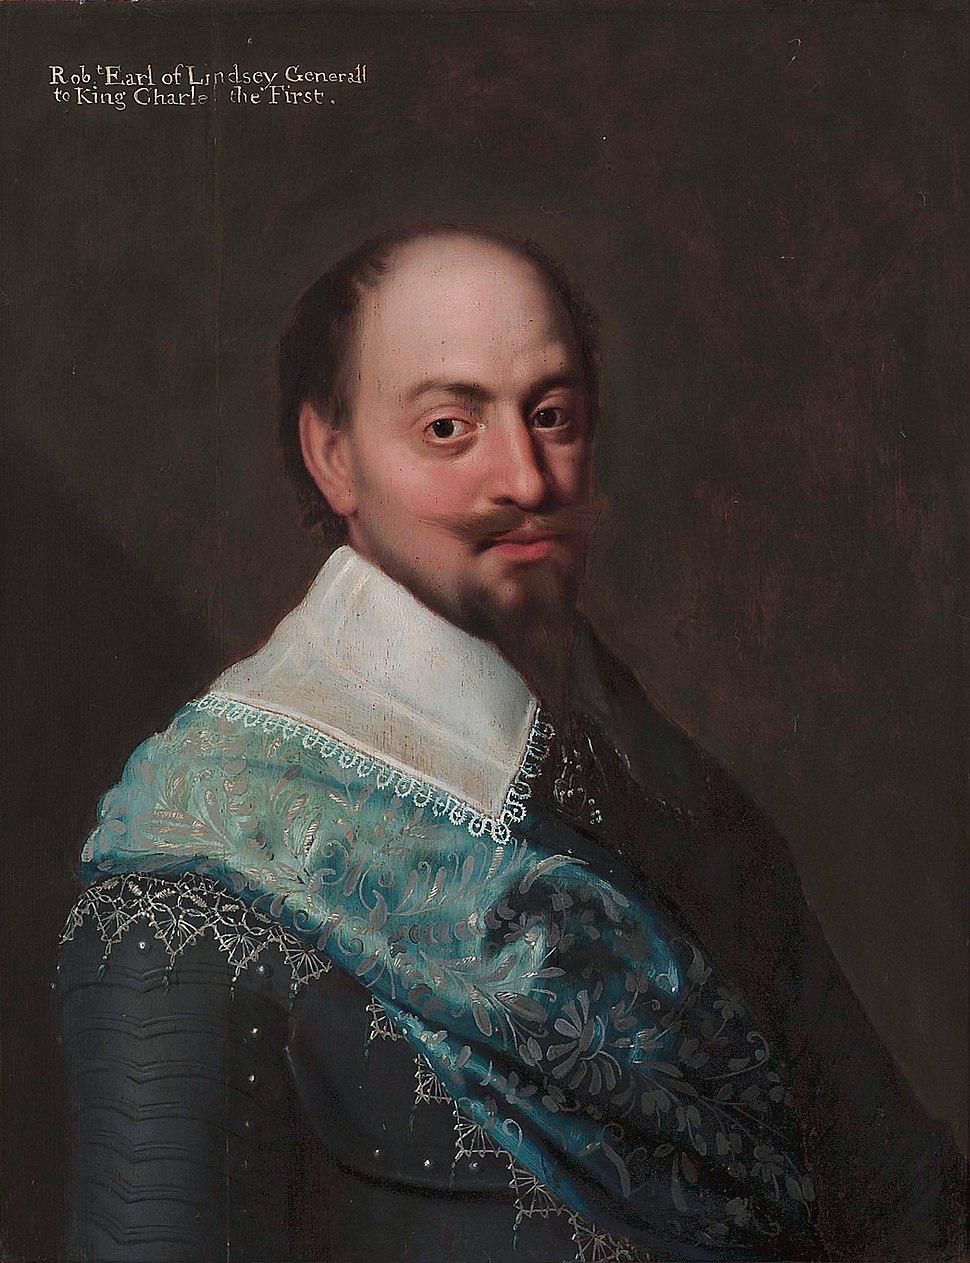 Robert Bertie, 1st Earl of Lindsey, by circle of Michiel Jansz van Mierevelt